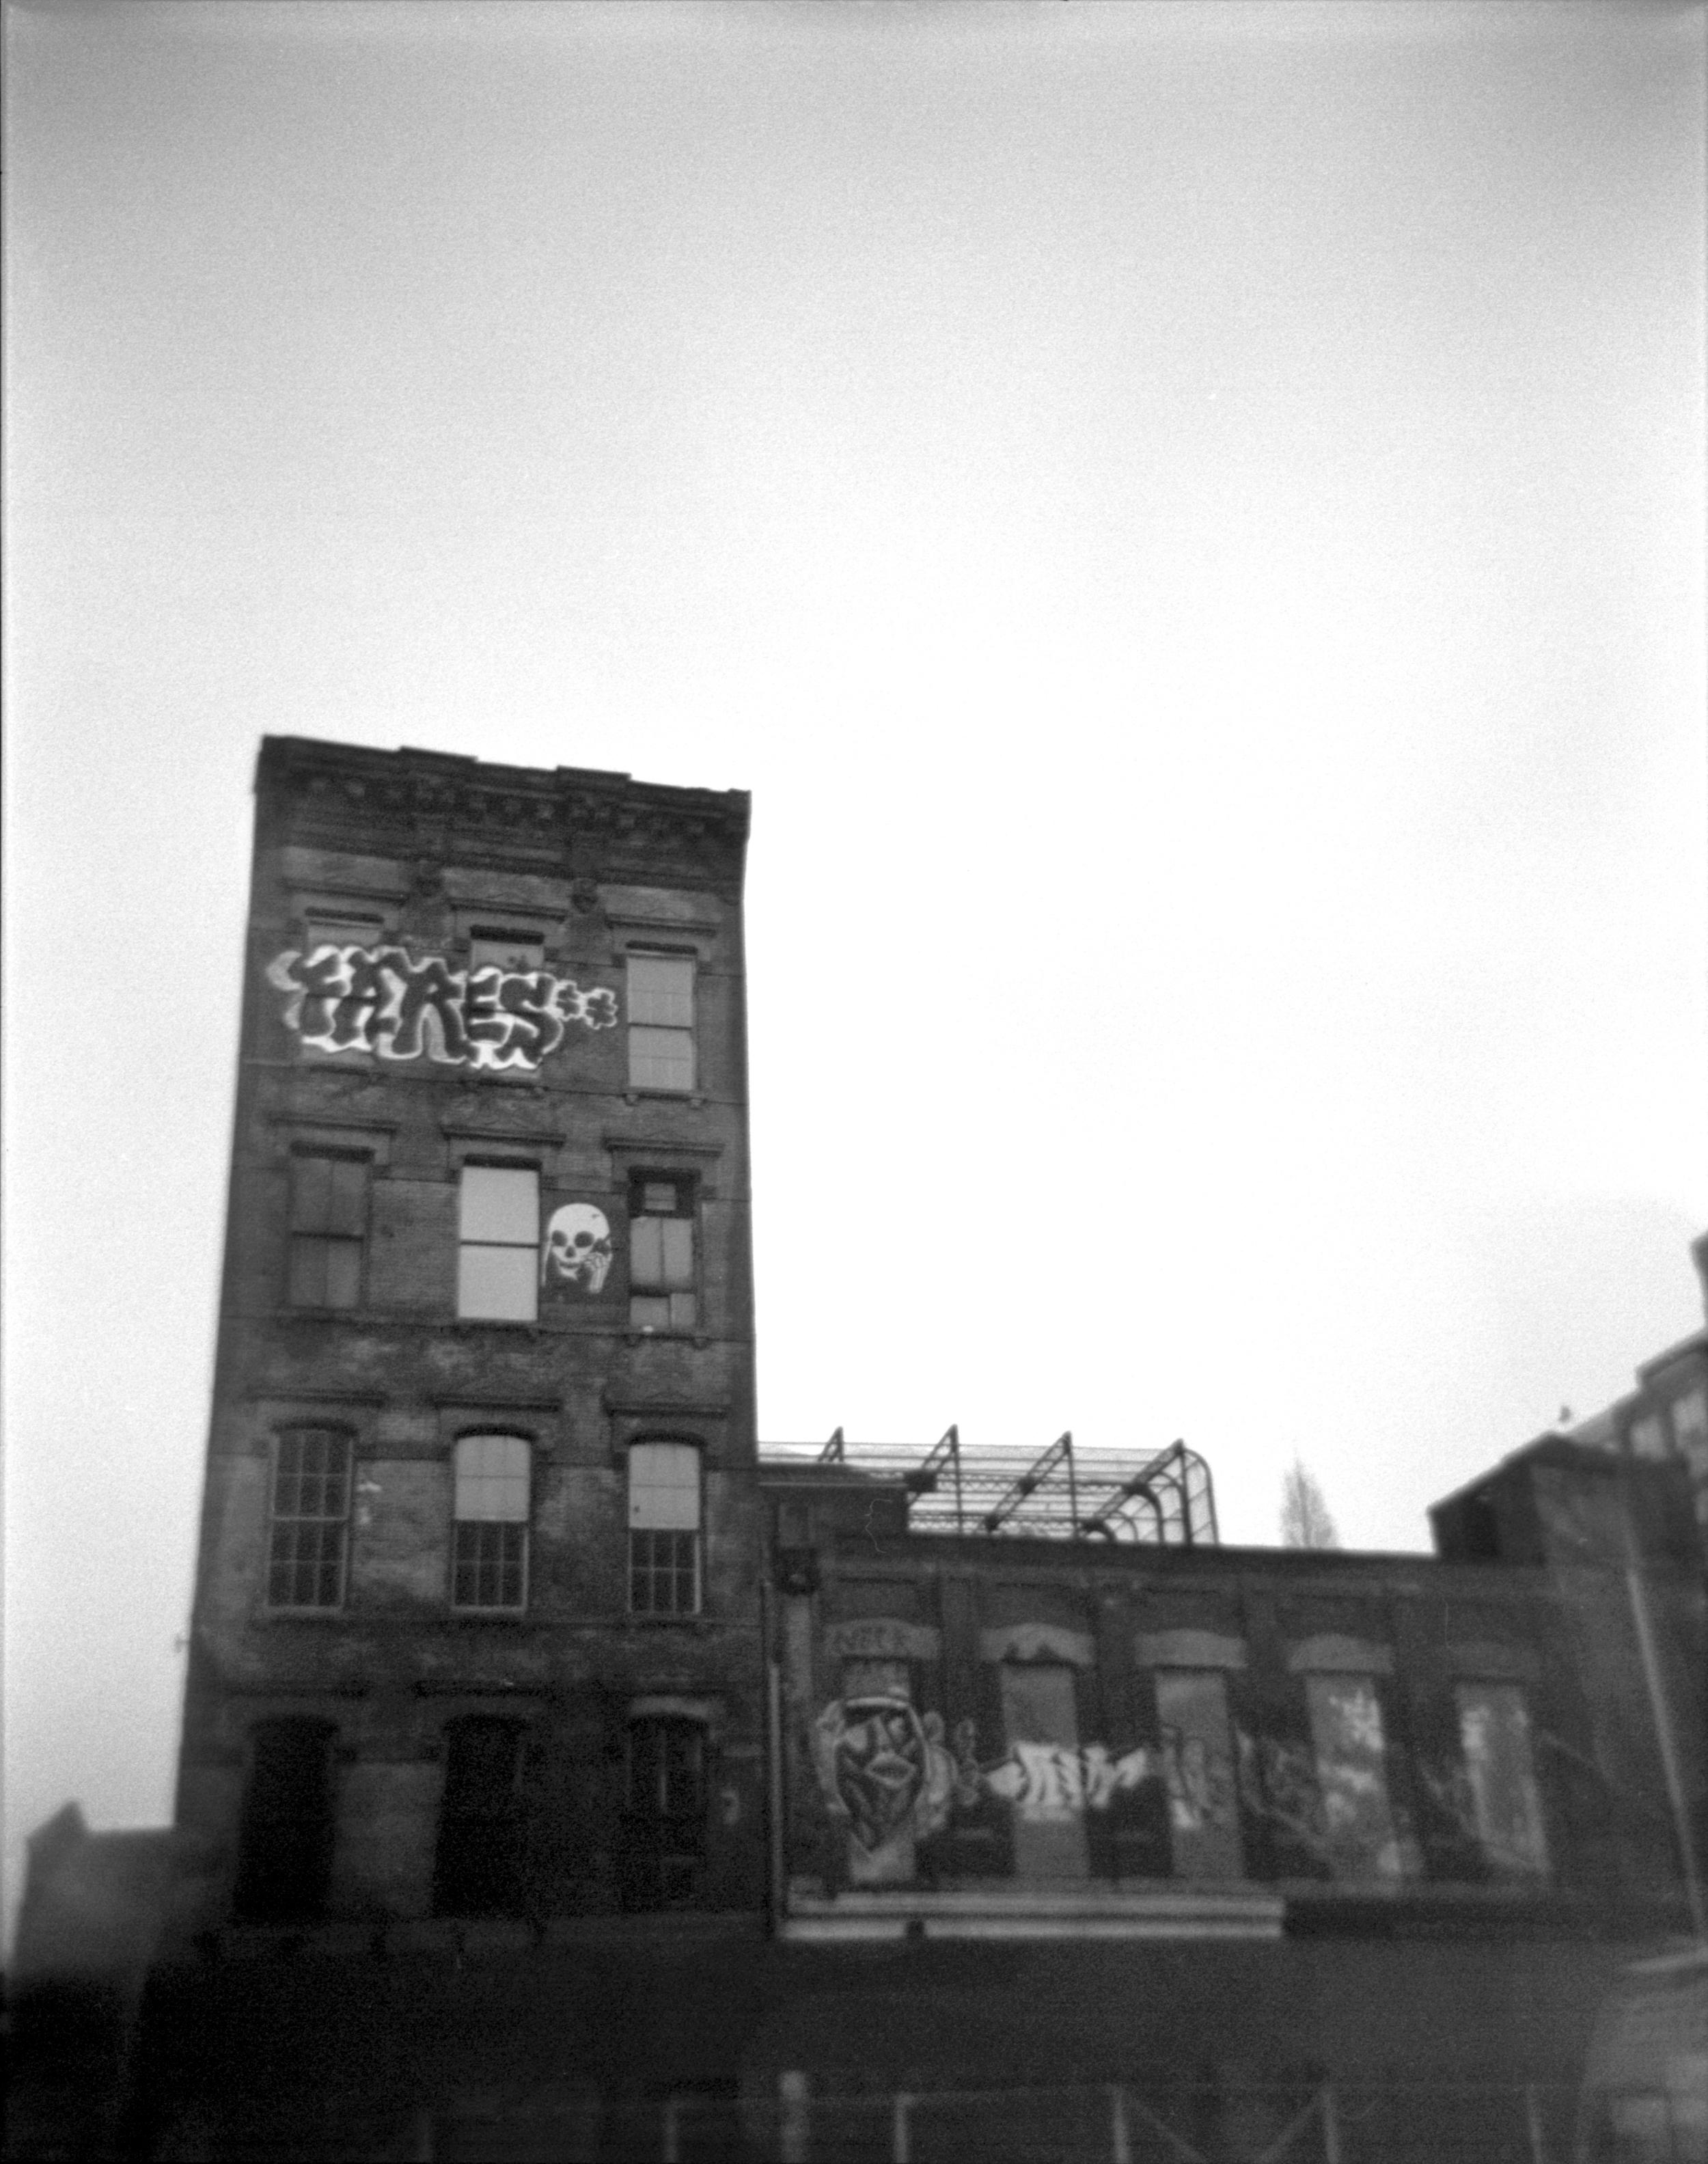 McGurk's Suicide Hall, Bowery, New York City